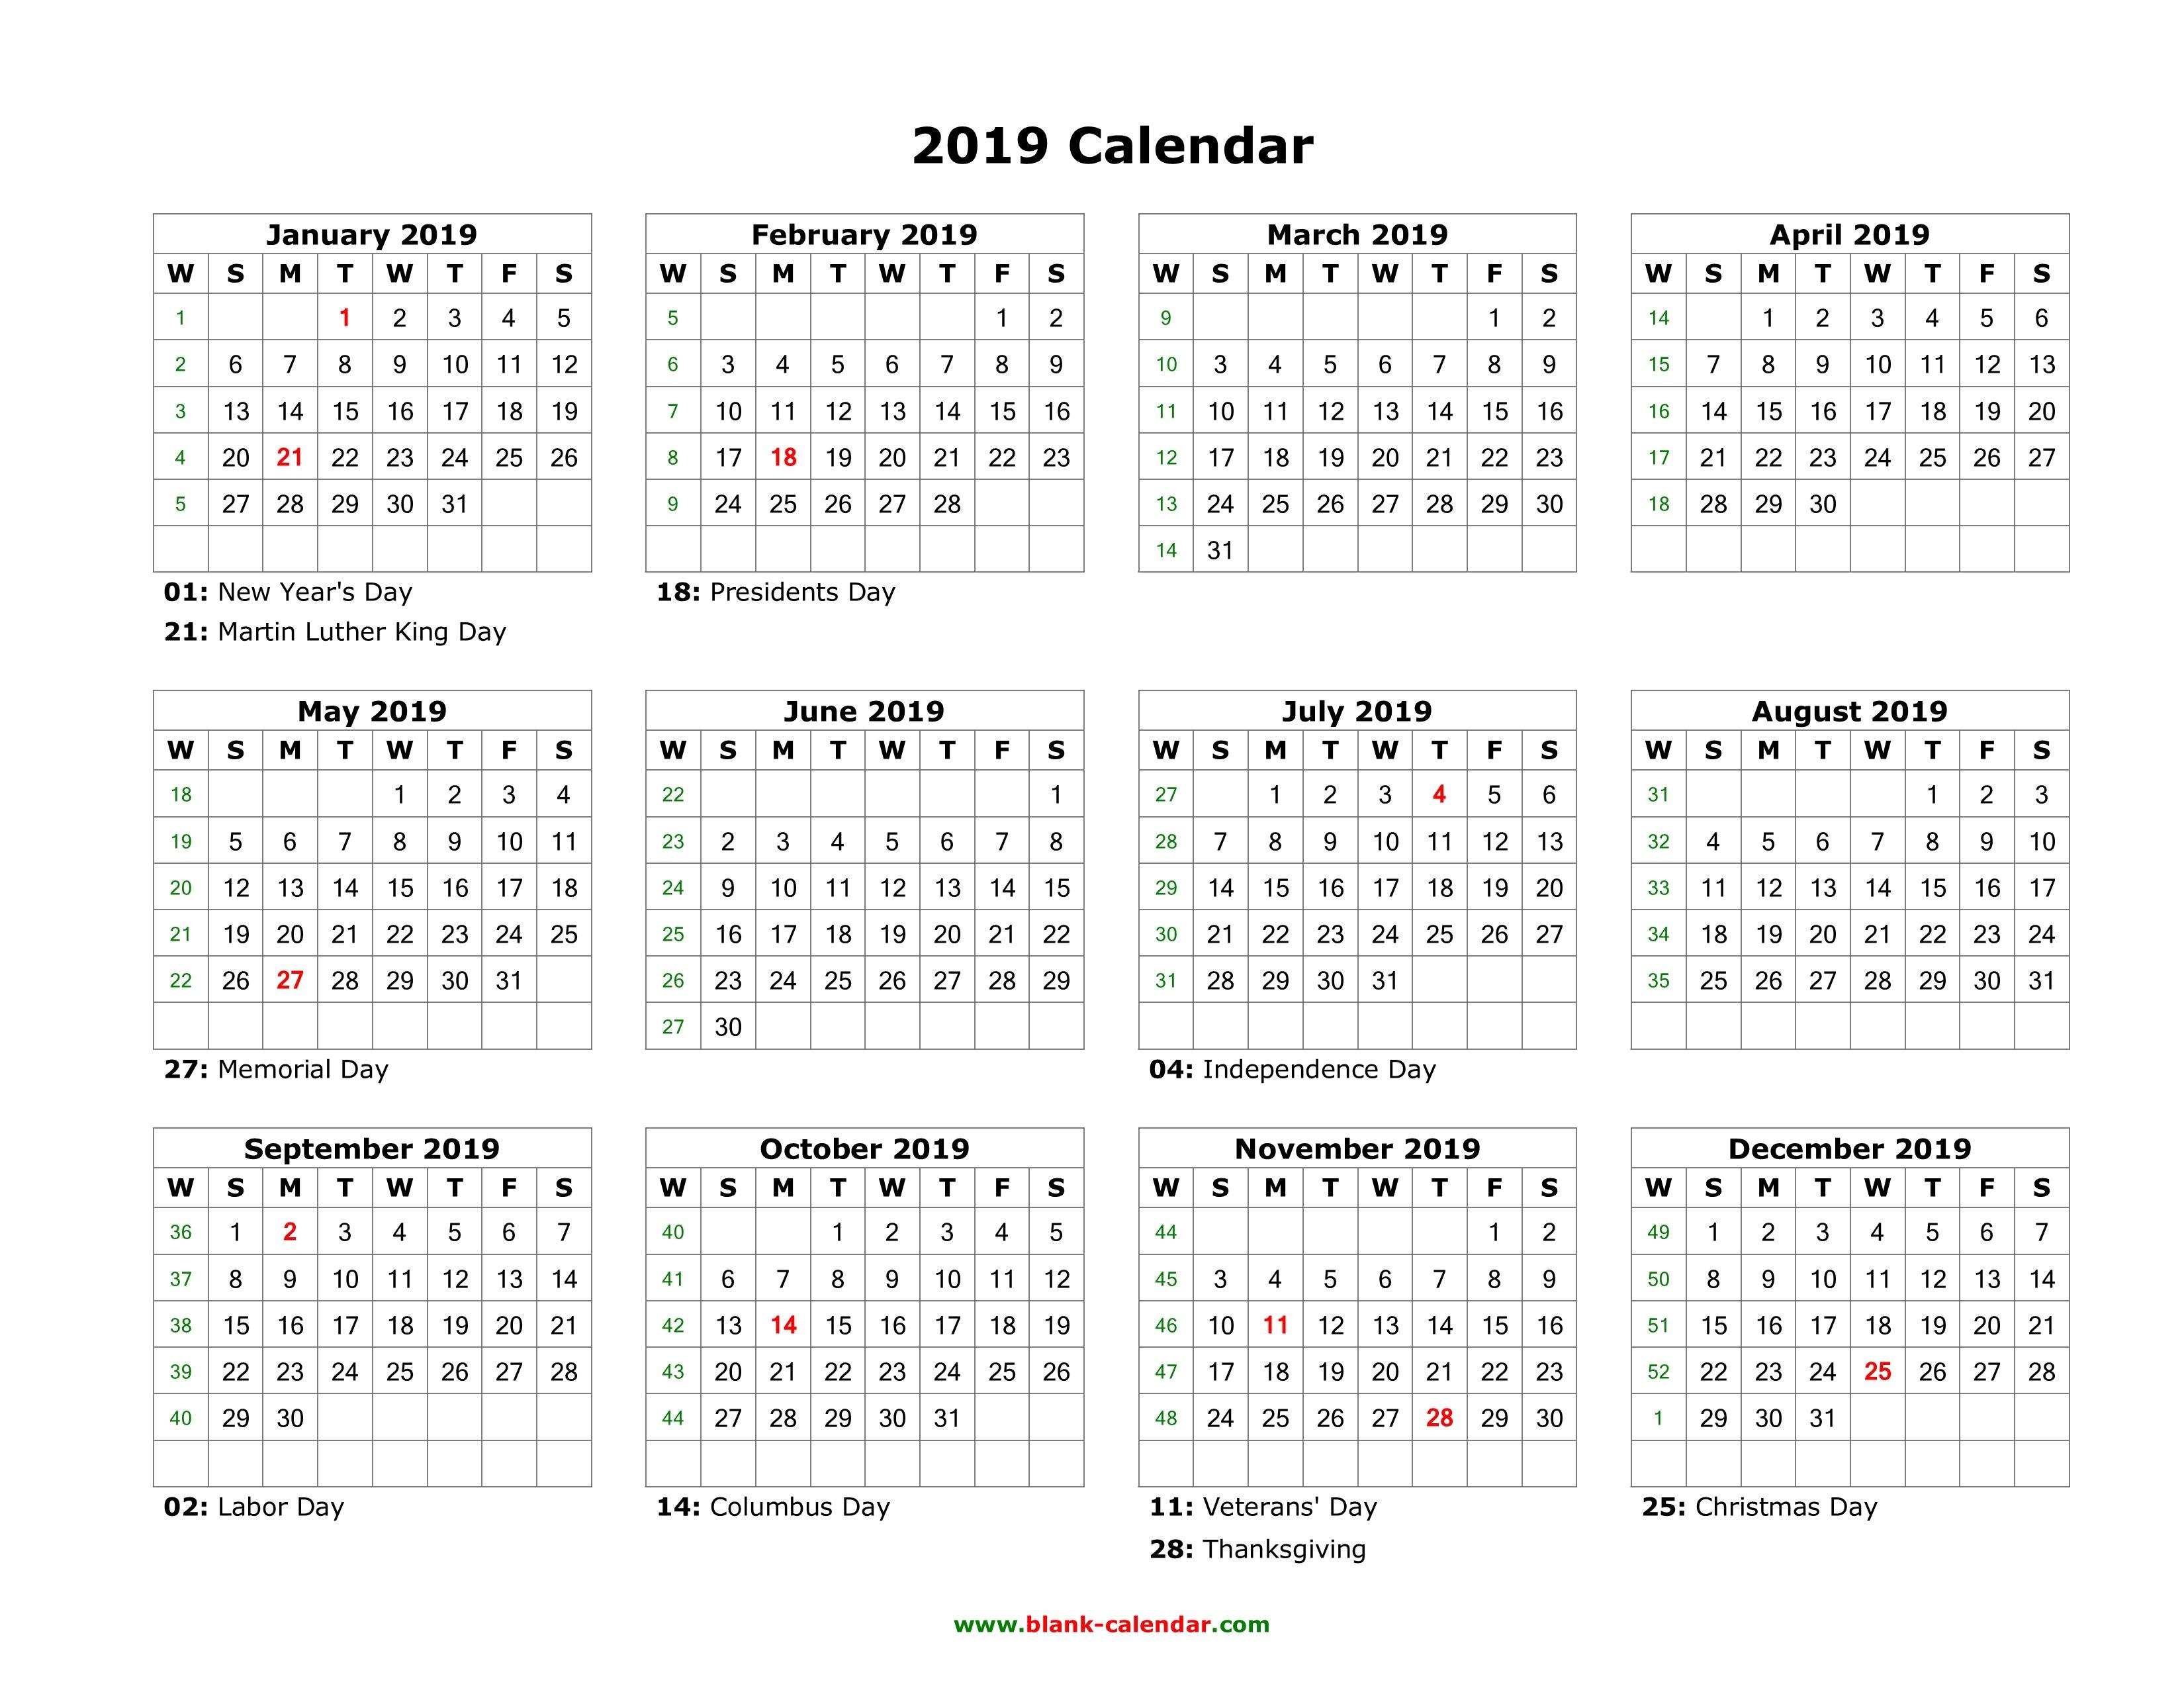 Blank Calendar 2019 | Free Download Calendar Templates Calendar 2019 Year Printable